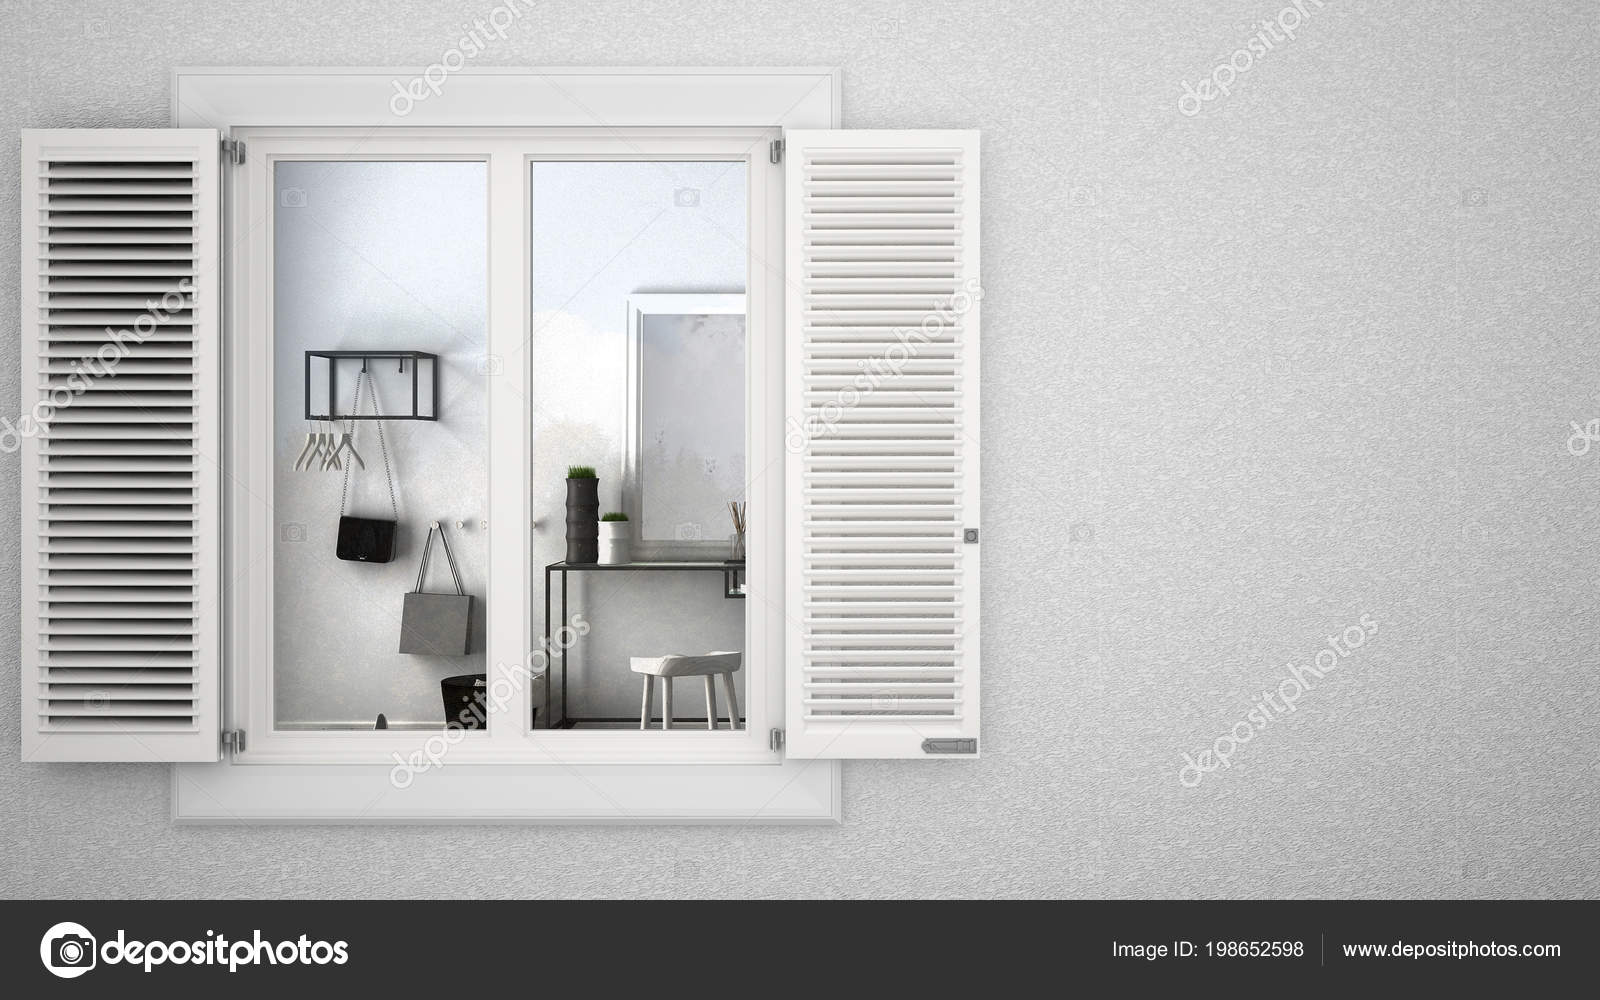 Intonaco Esterno Moderno : Intonaco esterno parete con finestra bianca con persiane